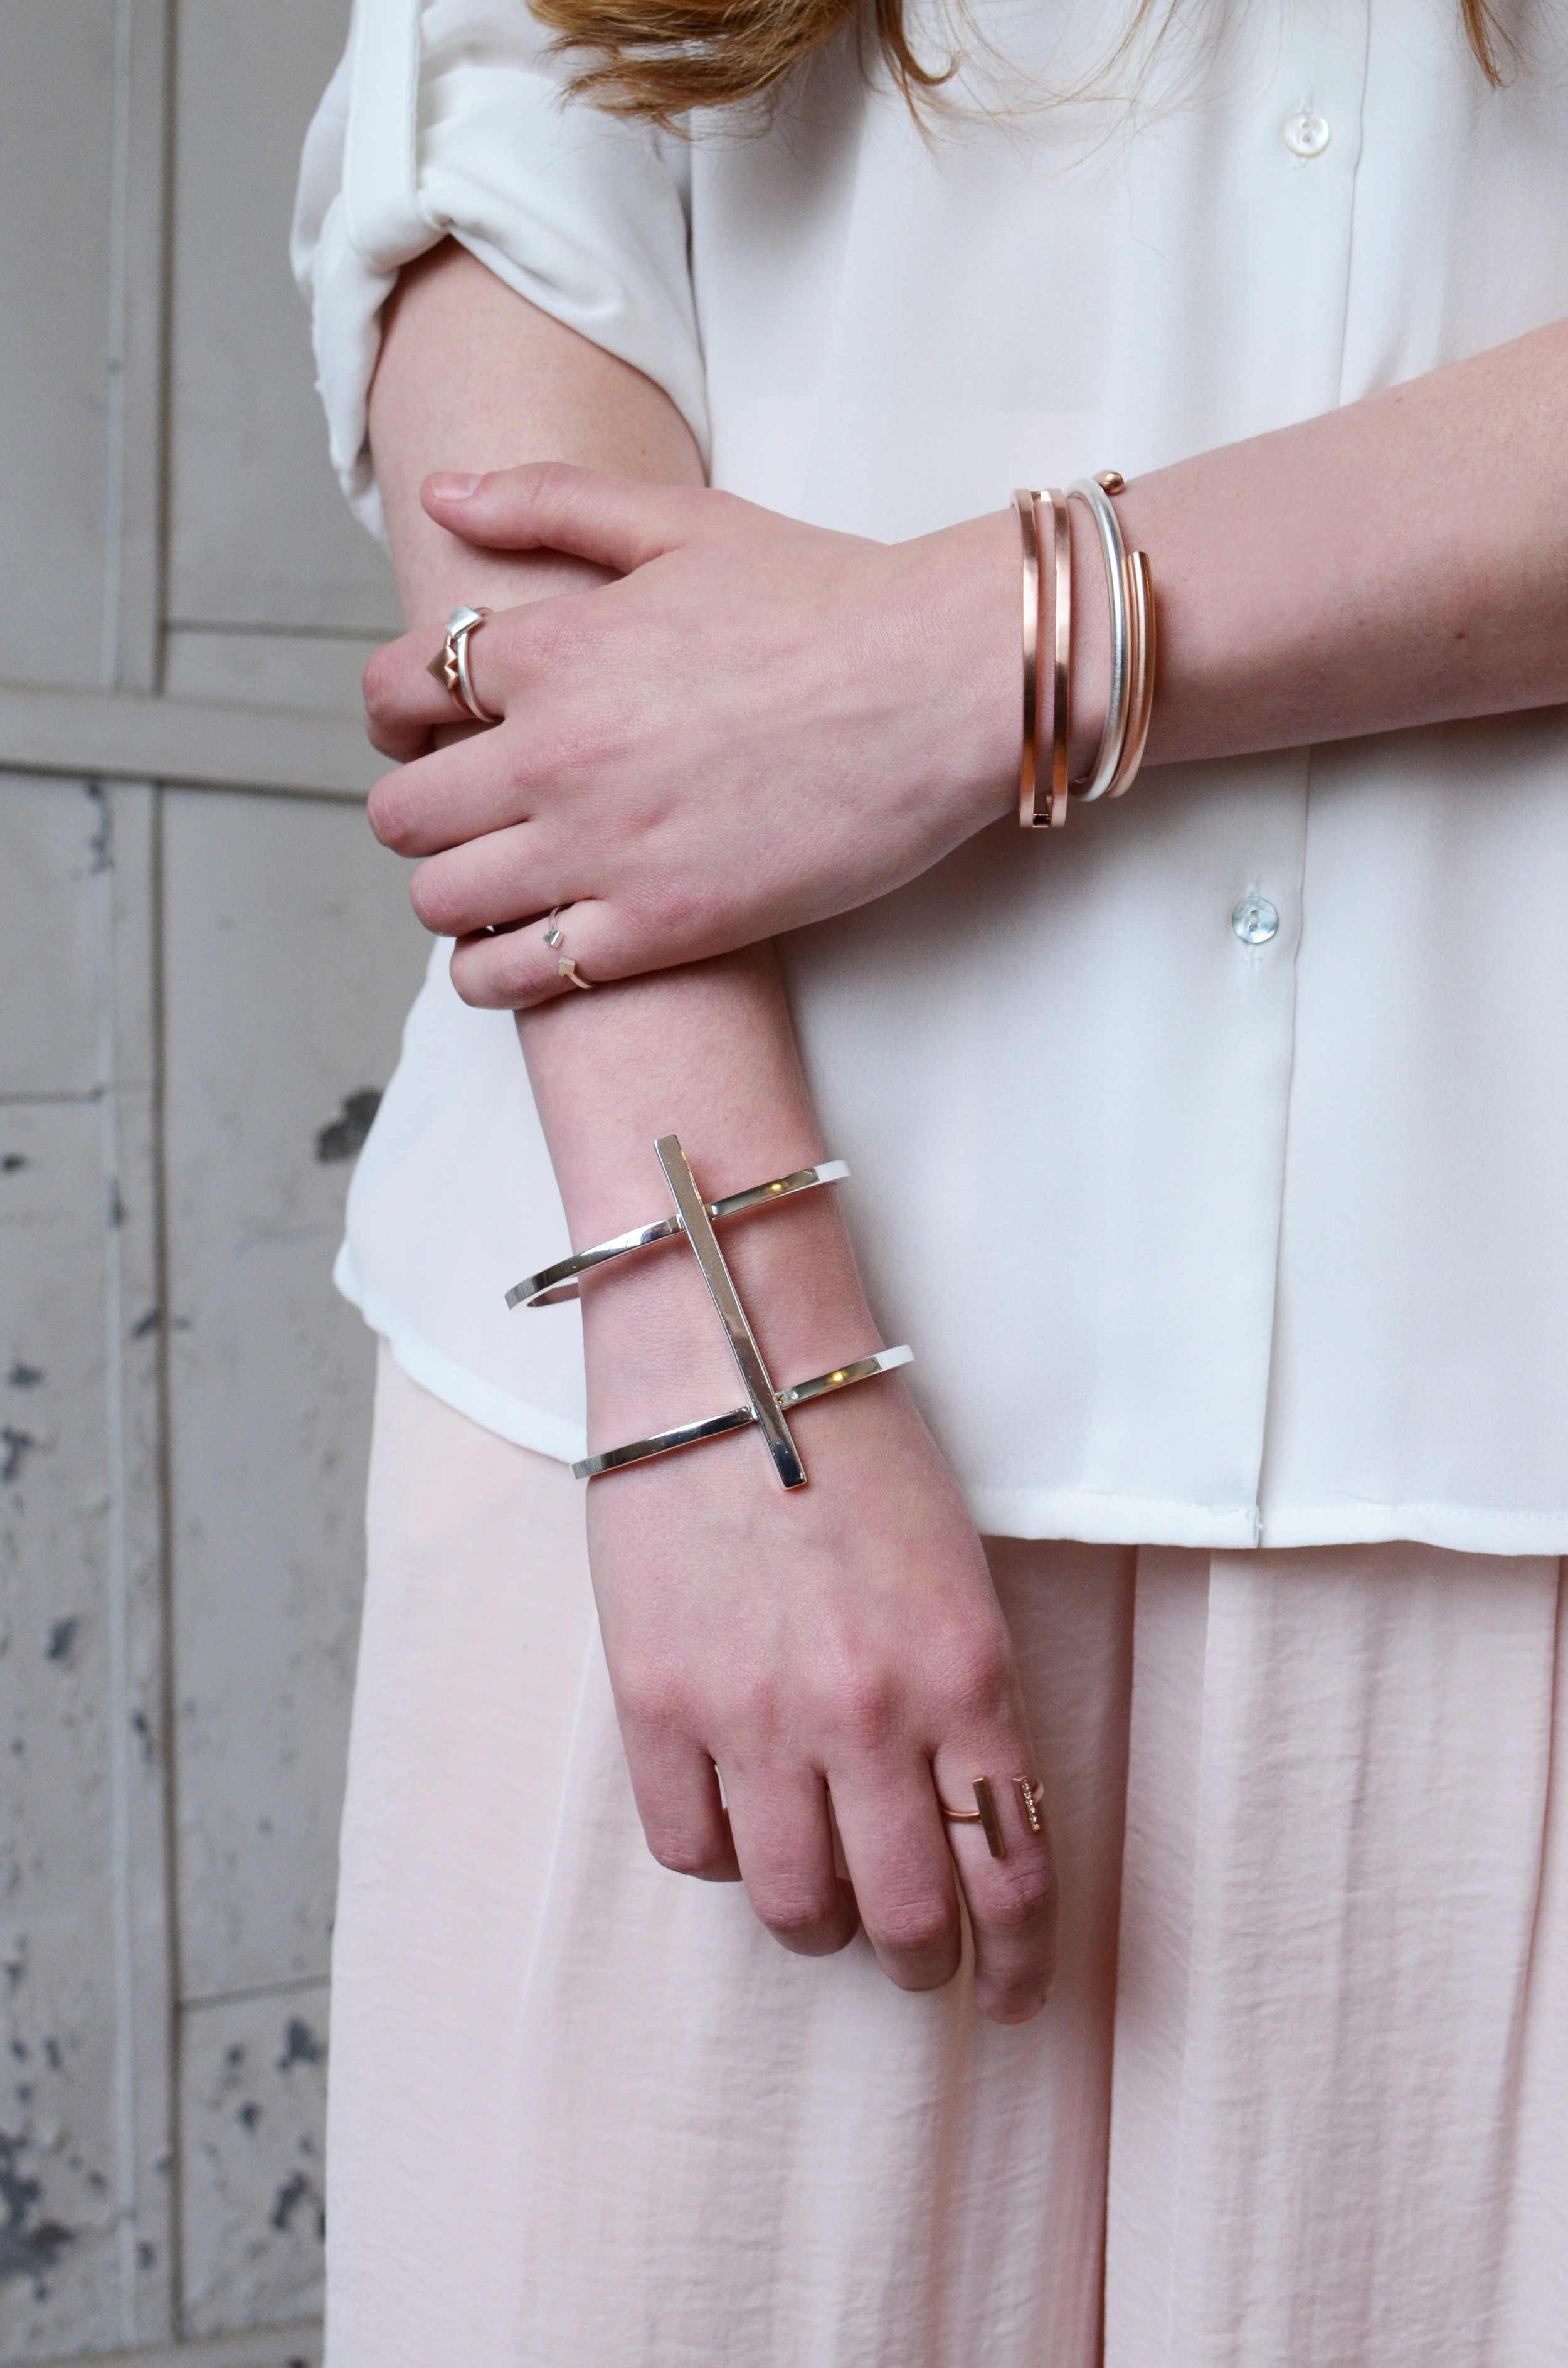 Hardt-Jewelry-2b.jpg